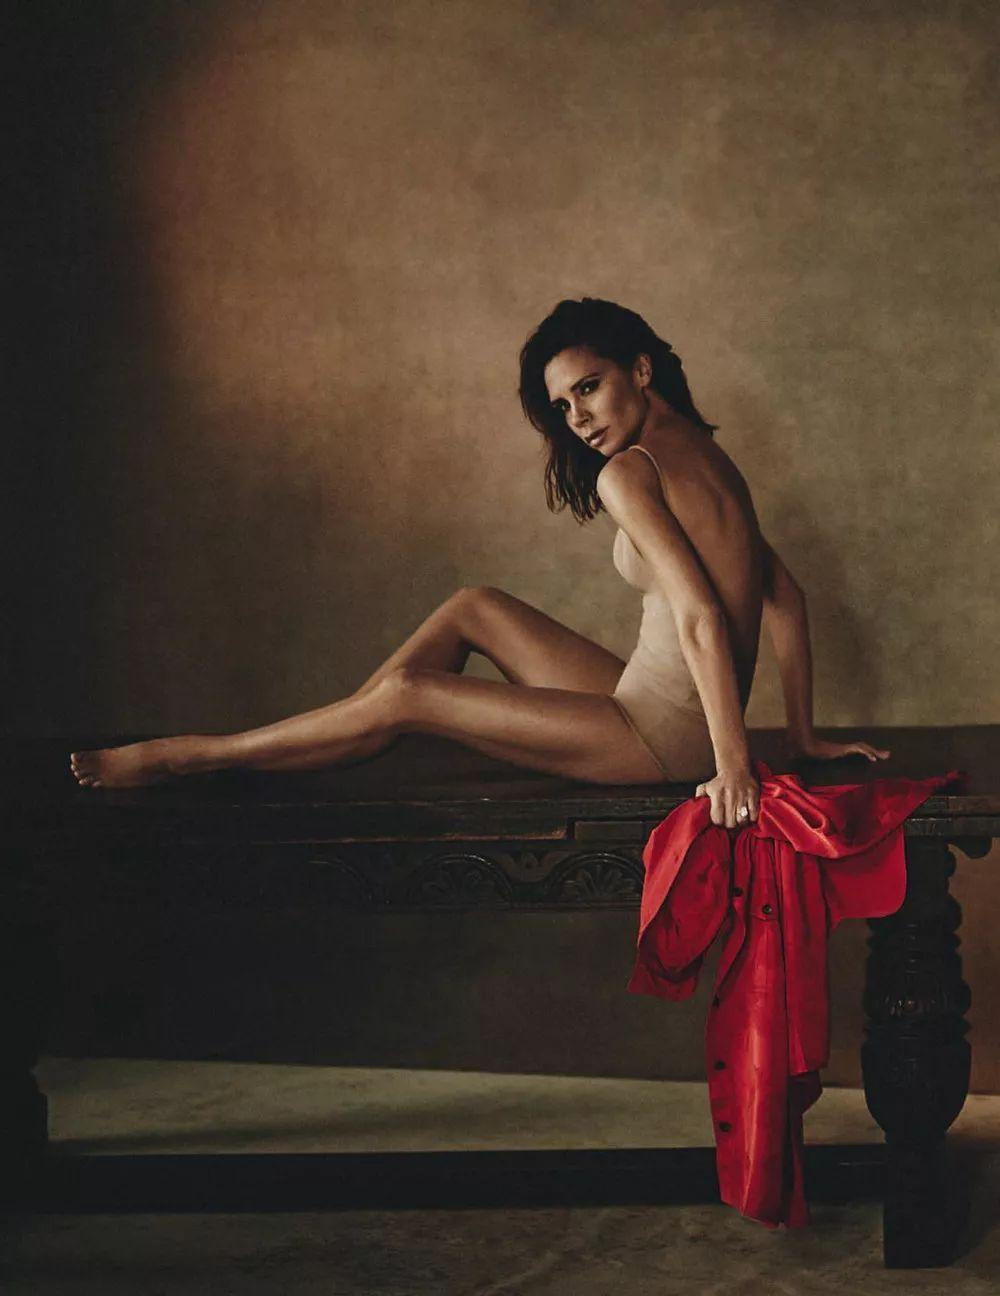 Victoria beckham nude photos